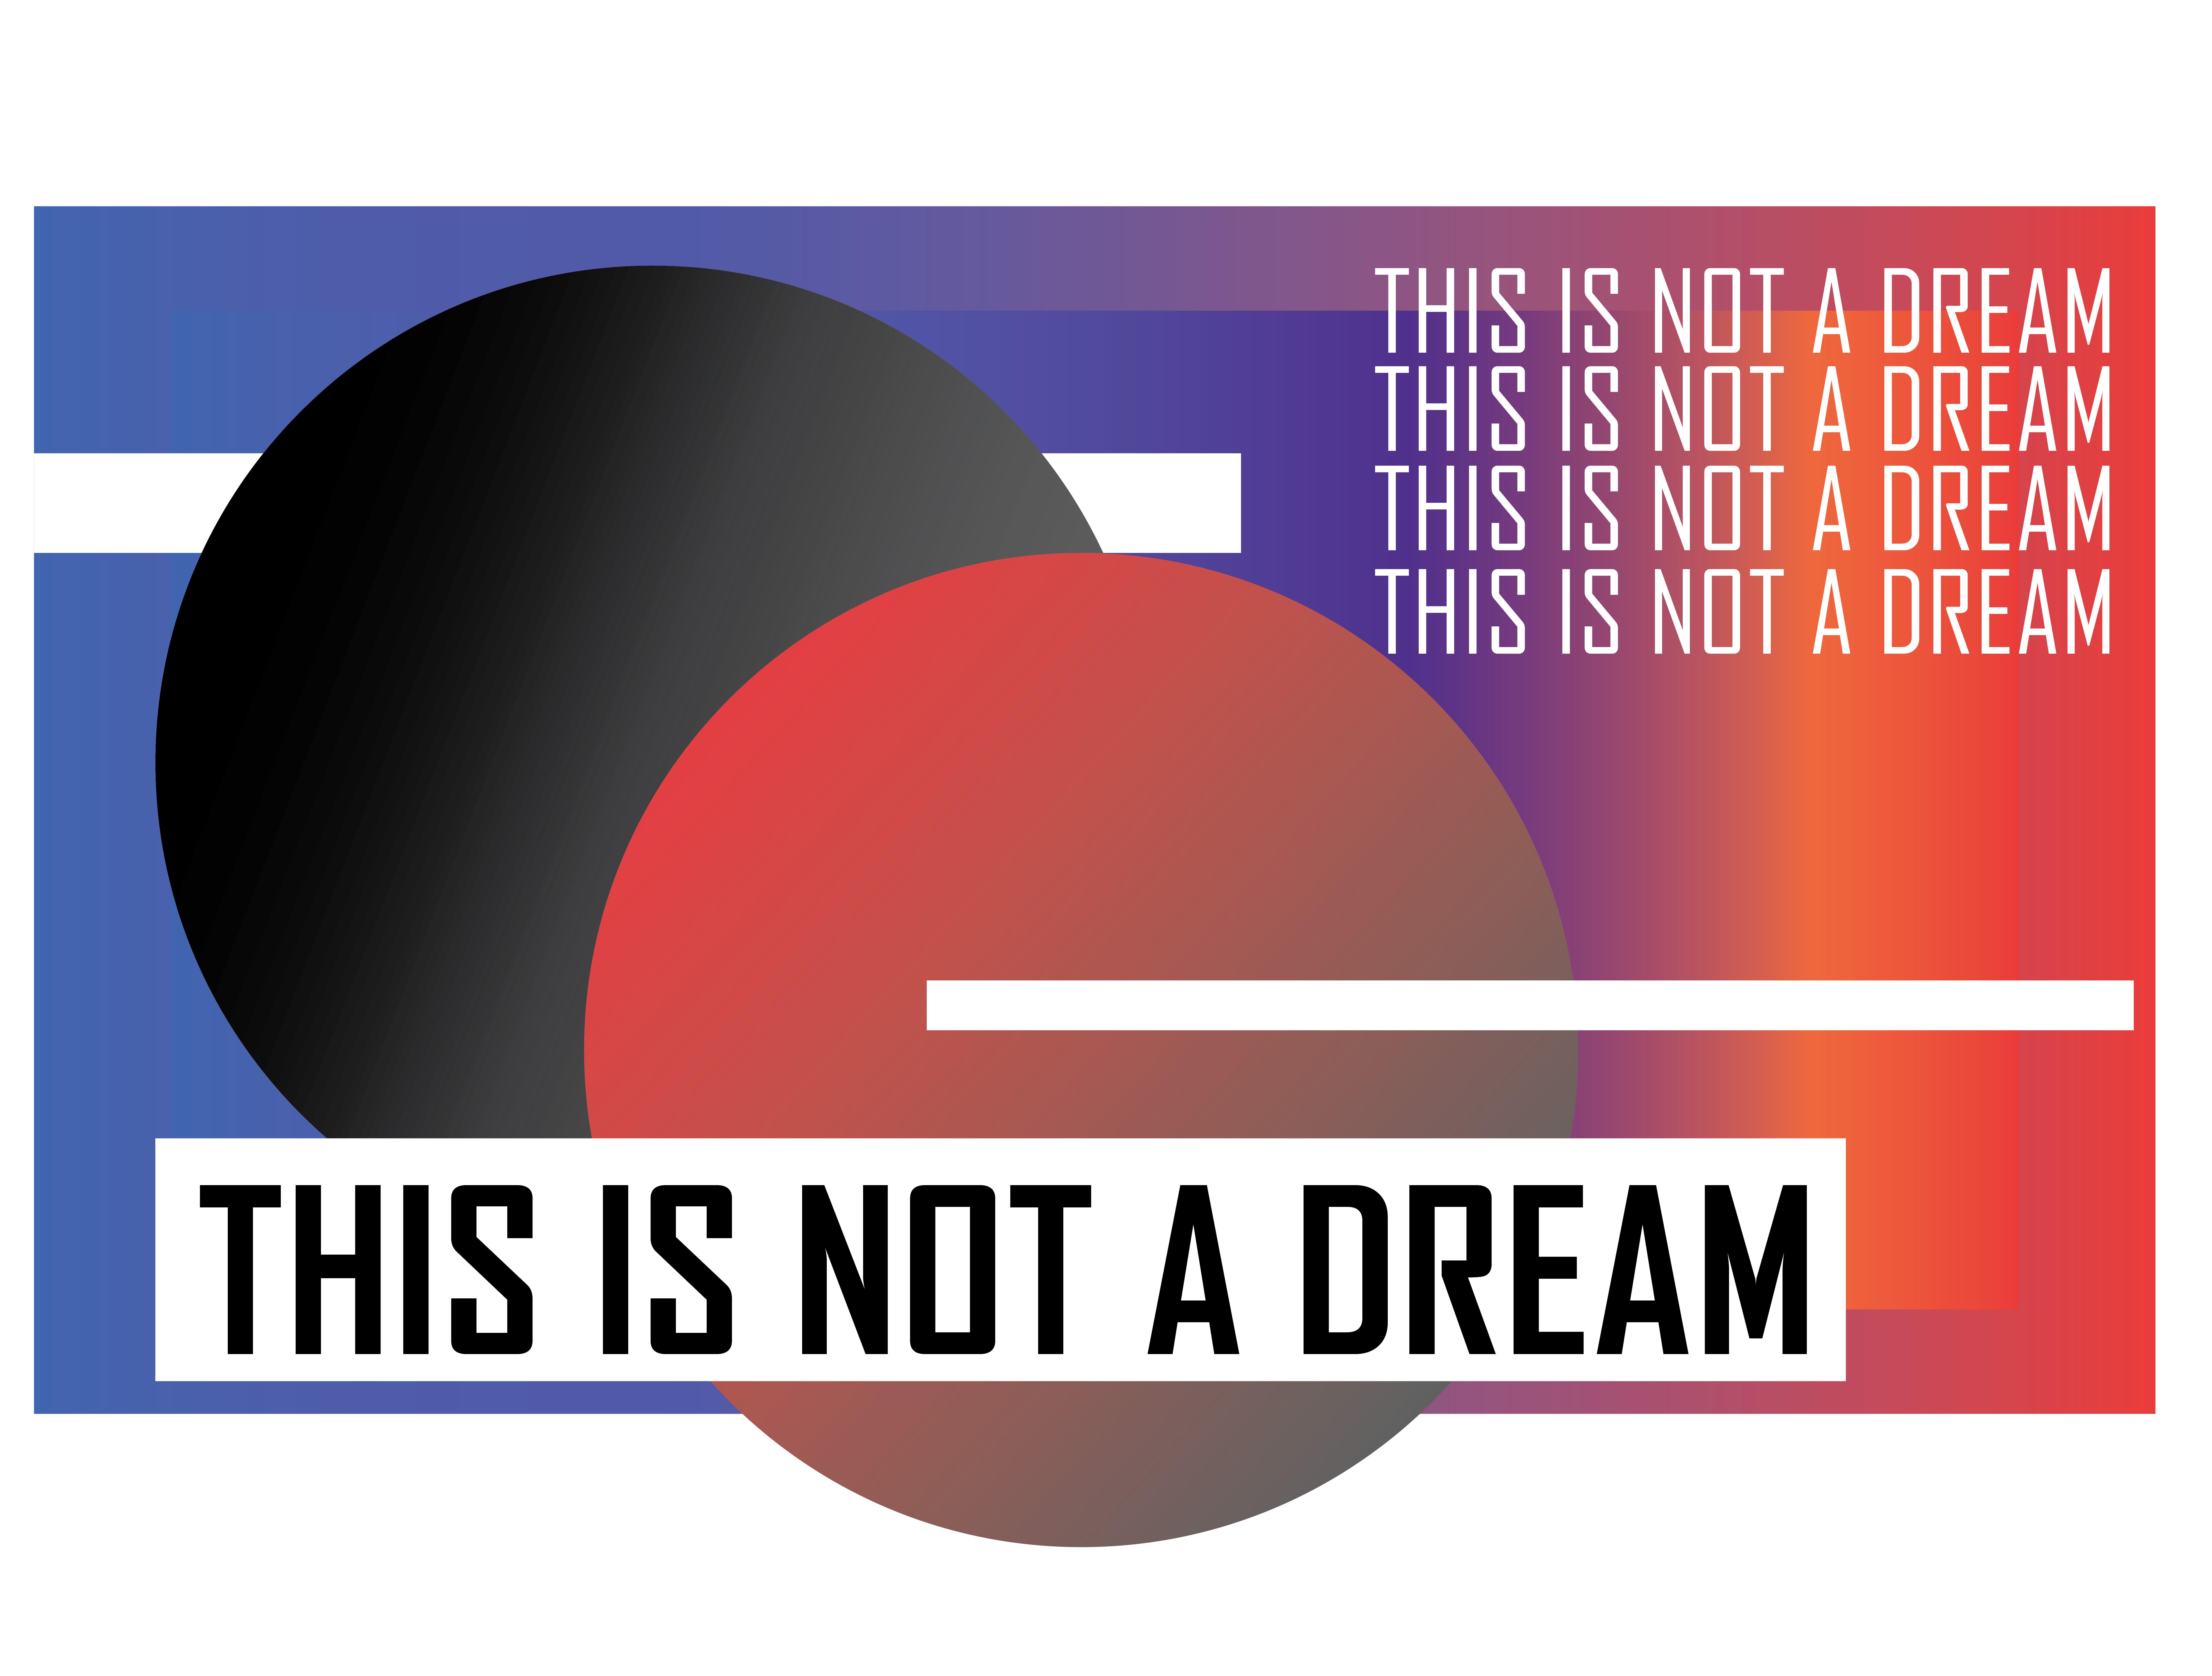 00 This is not a dream_crop-04 (1).jpg